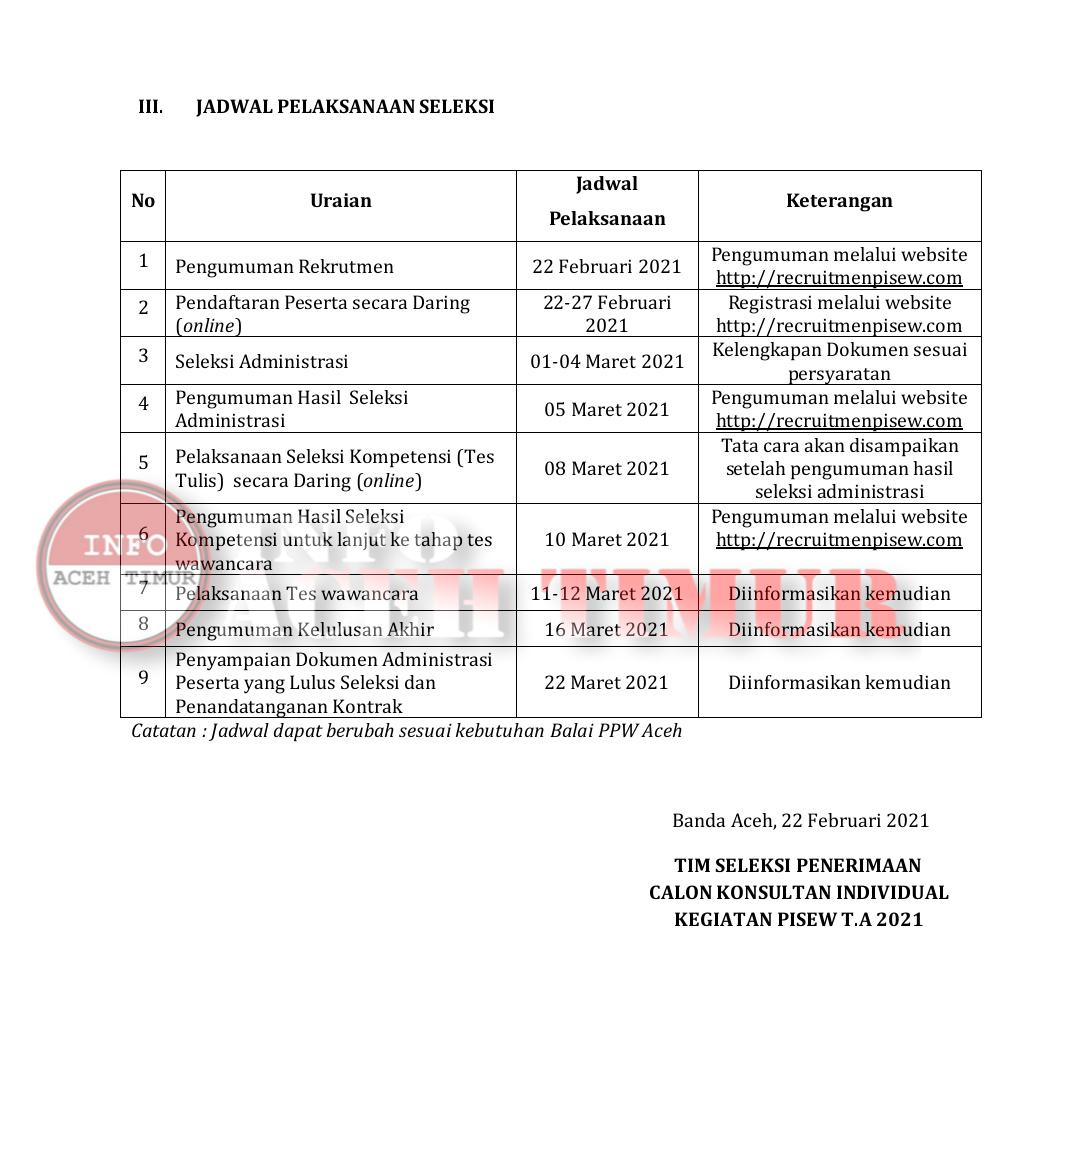 Halaman 2 Lowongan Kerja Pupr Aceh 2021 Minimal S1